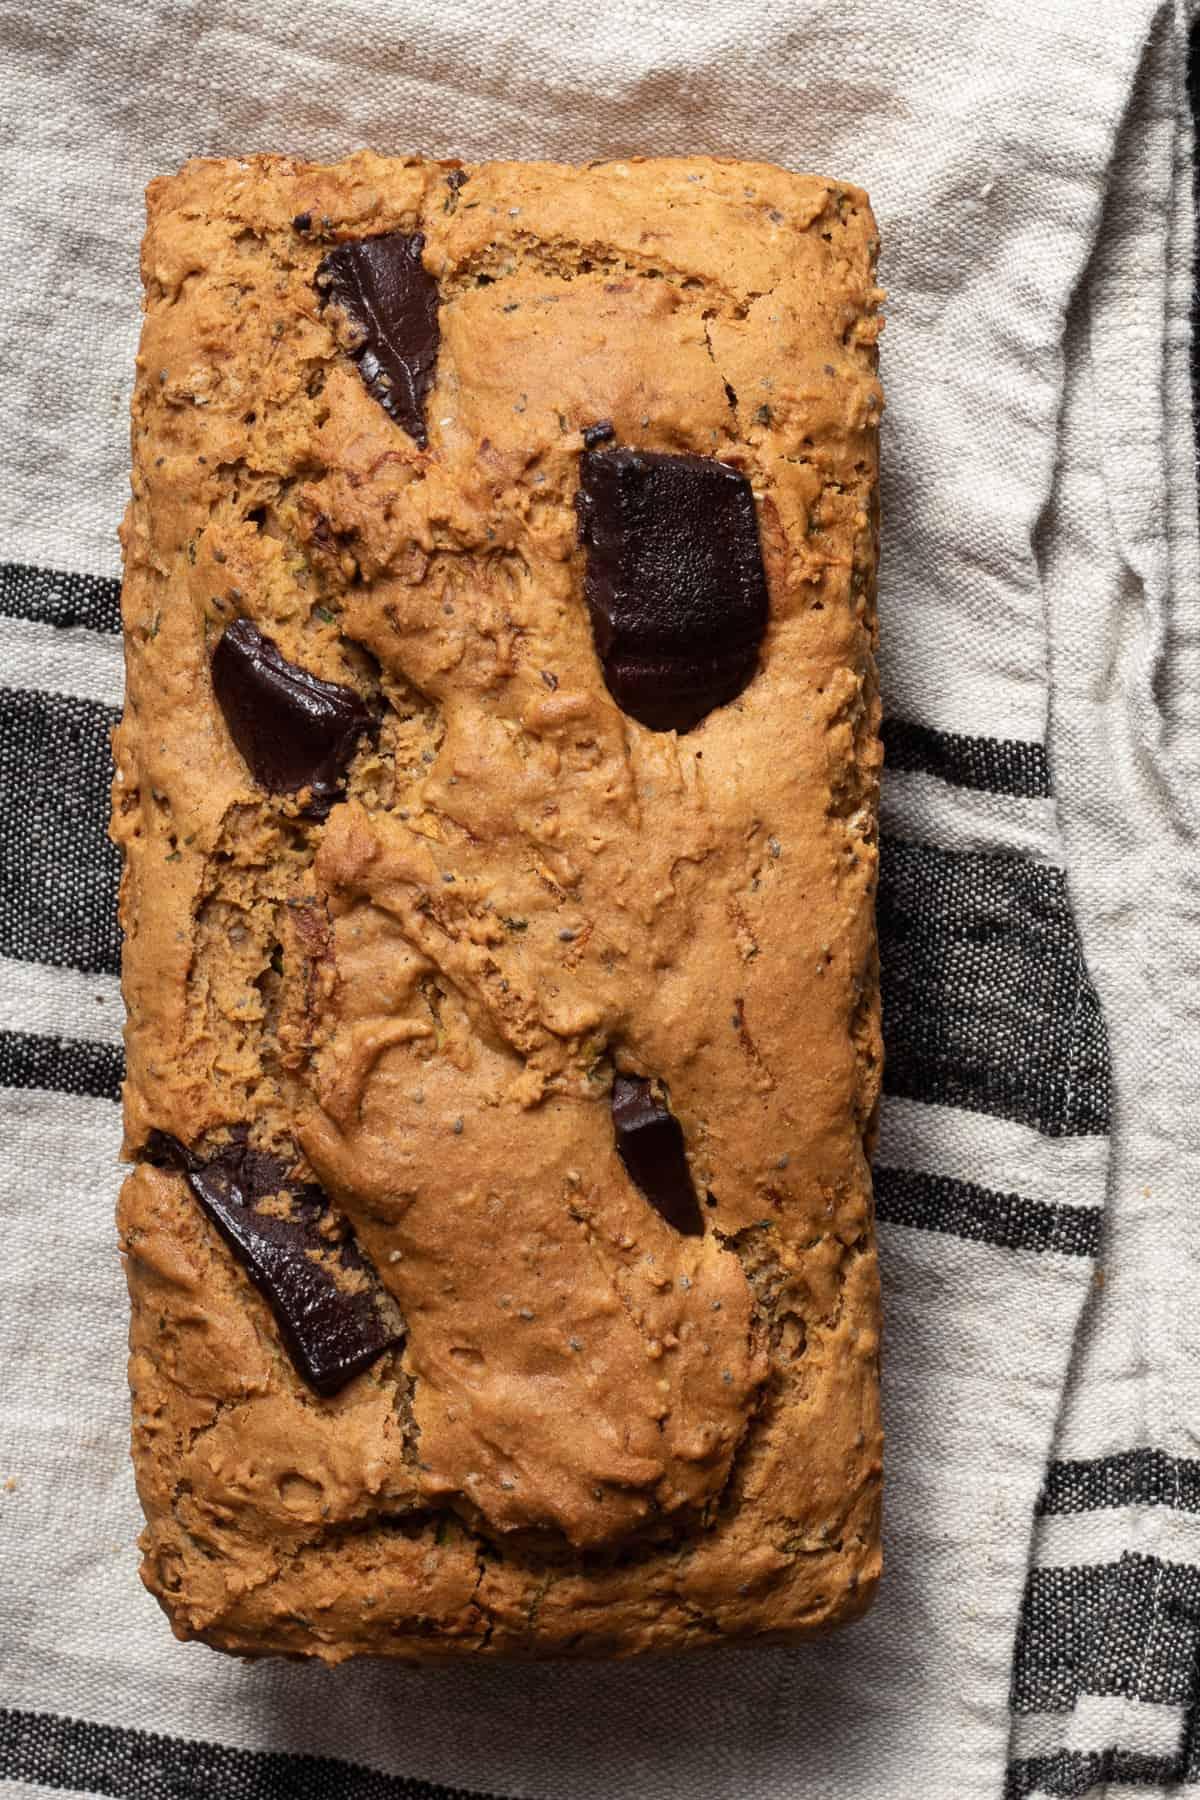 vegan zucchini loaf after baking